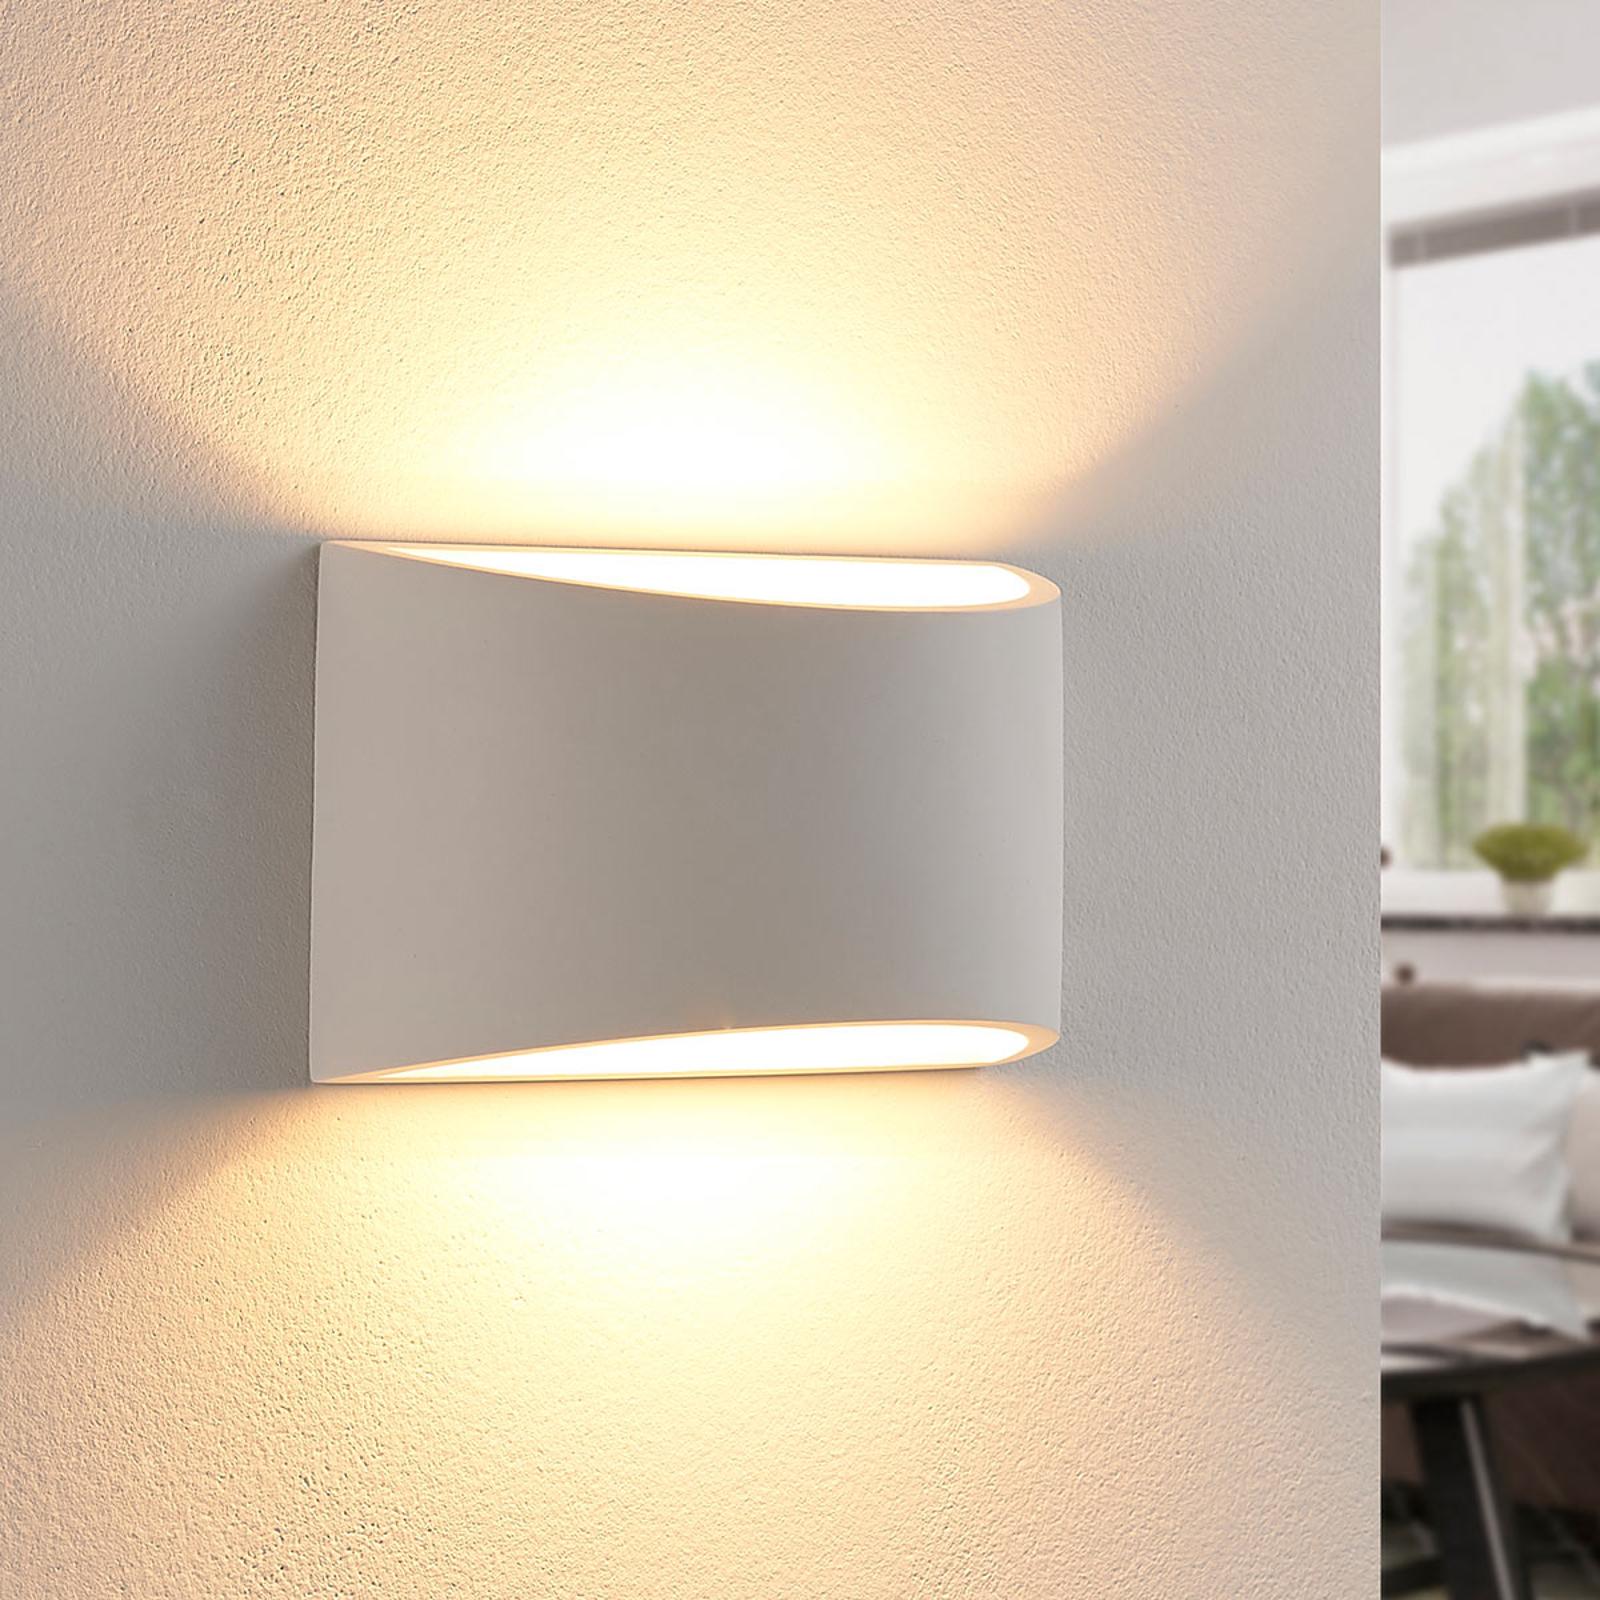 Formskön LED-vägglampa Heiko av gips